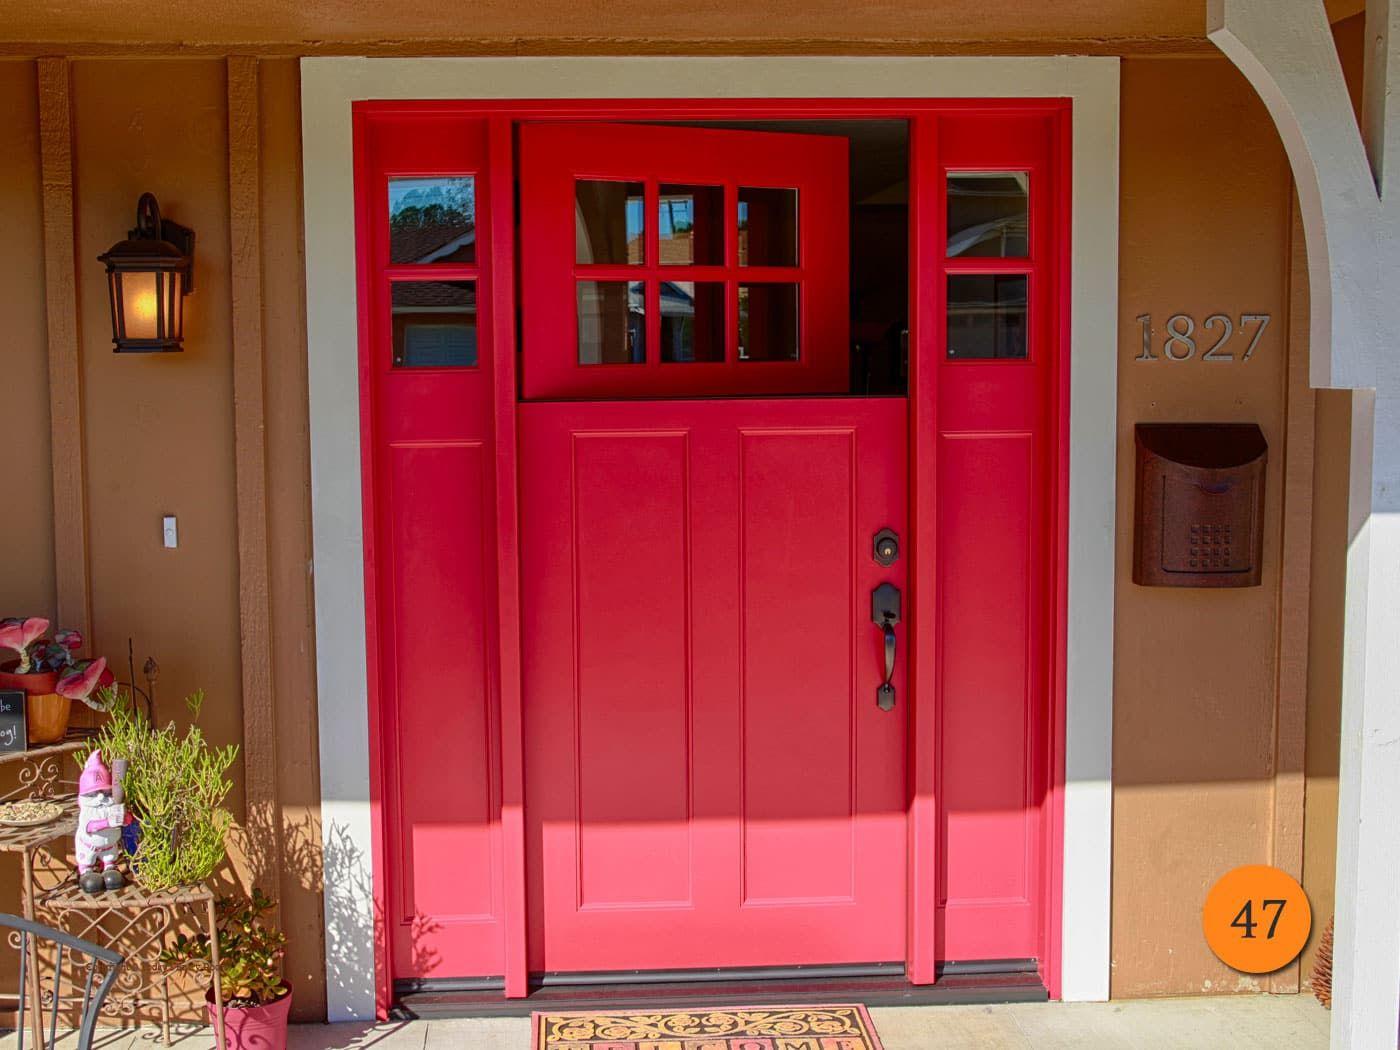 Craftsman Single 36 X80 Plastpro Drs3cg000 Fibergl Dutch Door With 2 Sidelights In 5 Foot Wide Entryway Smooth Skin Painted Scarlet Past Red